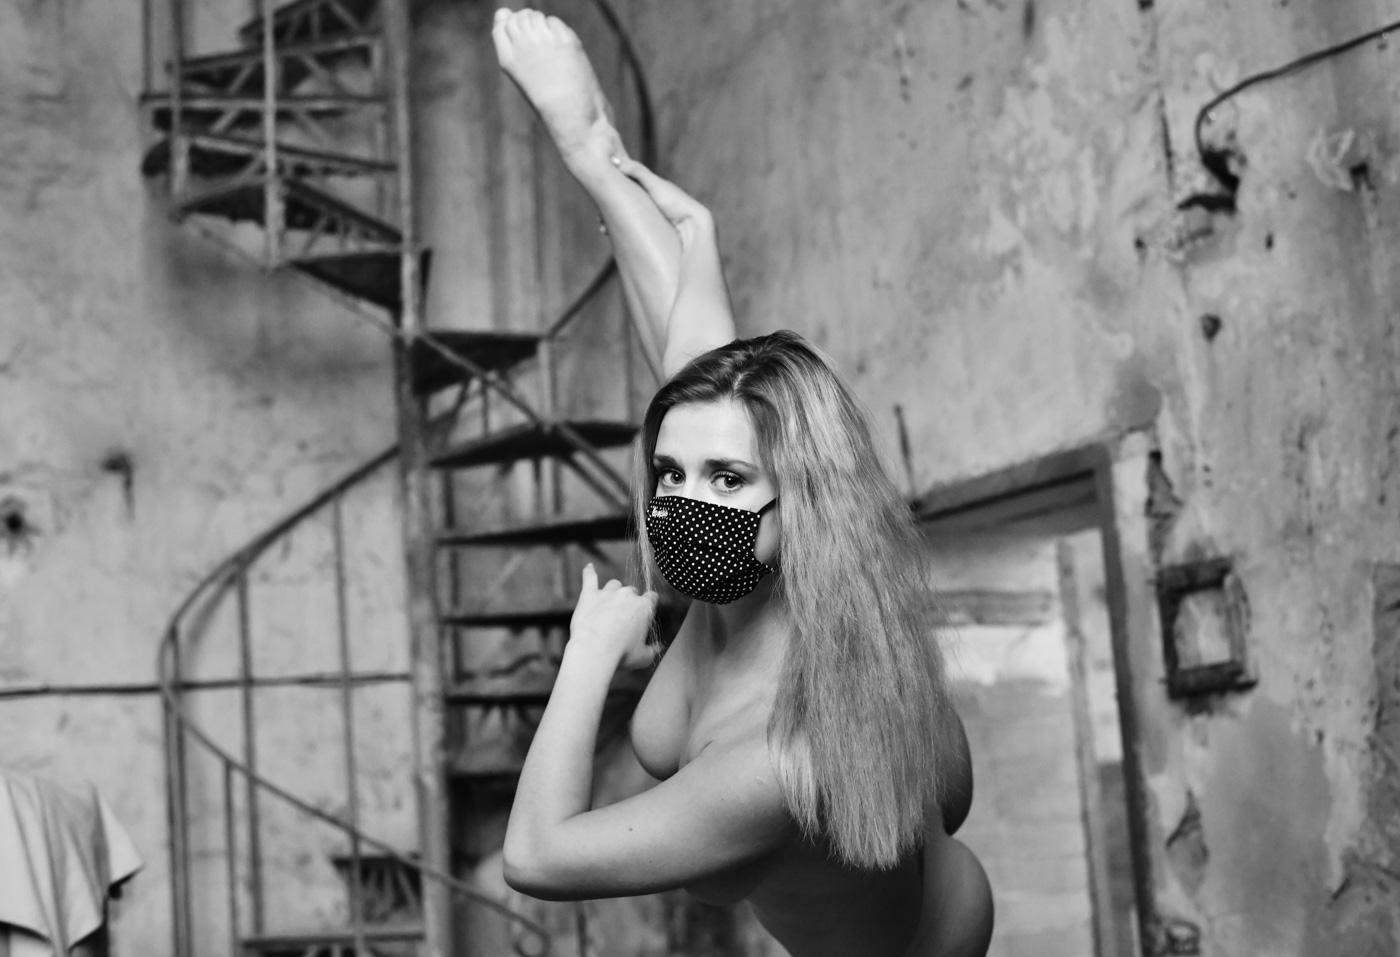 Tanečnice Barbora Onderková. Foto: © Martin Straka/Reflex